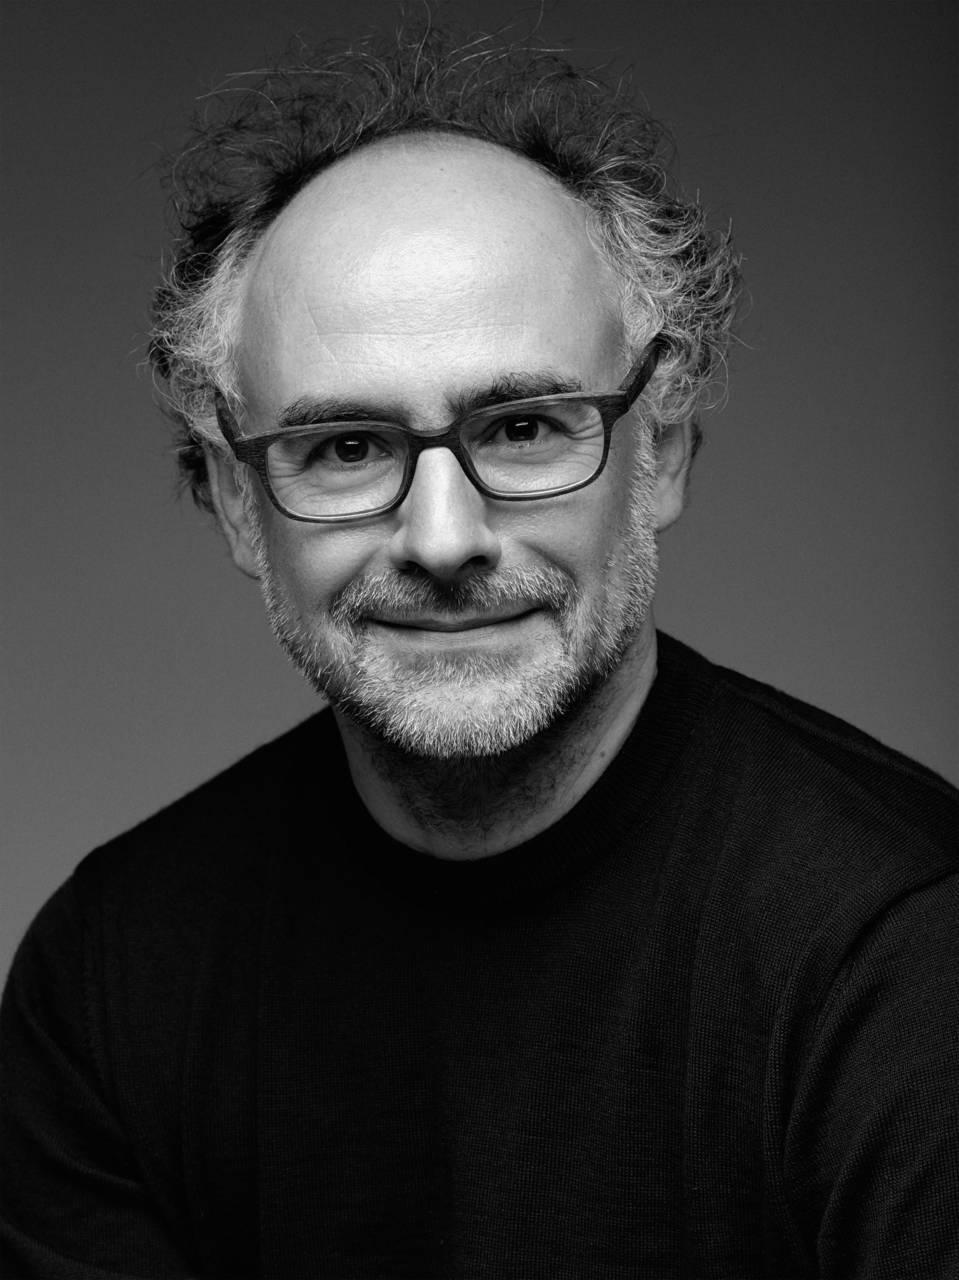 Portrait masculin